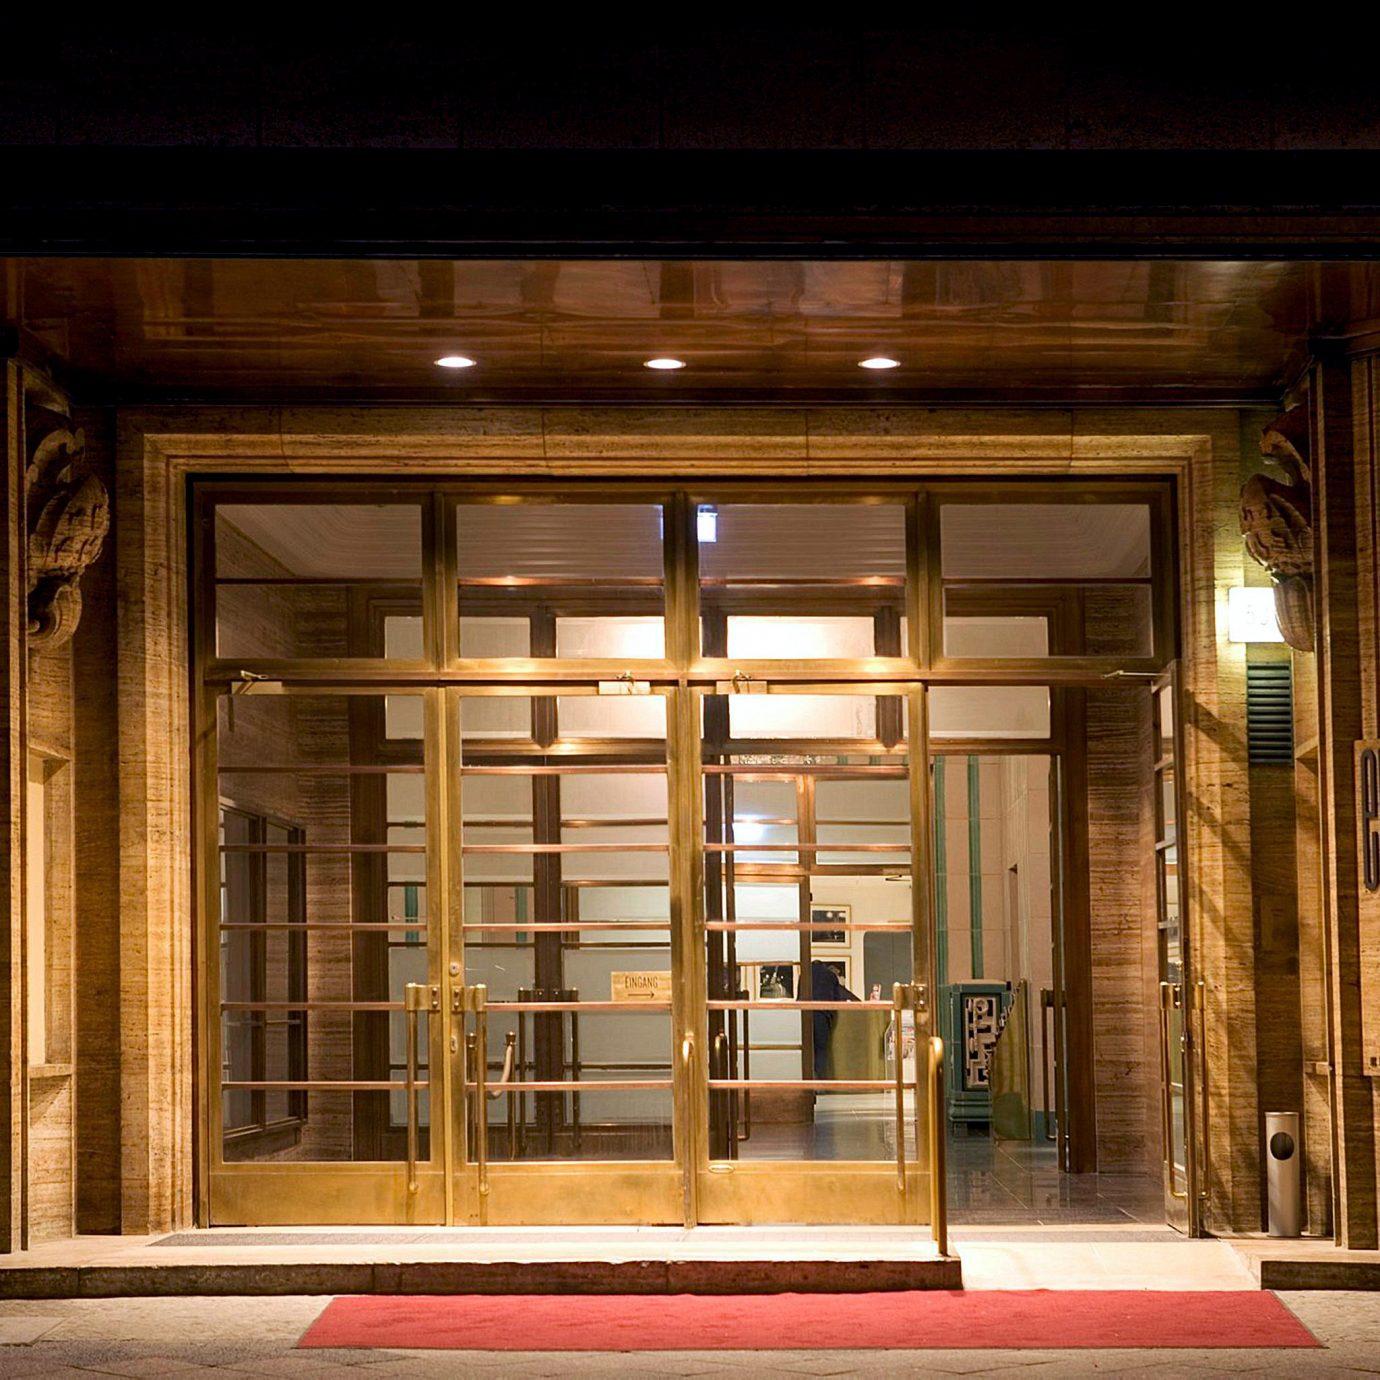 Exterior Luxury Modern Nightlife building Architecture house lighting home door Lobby hall